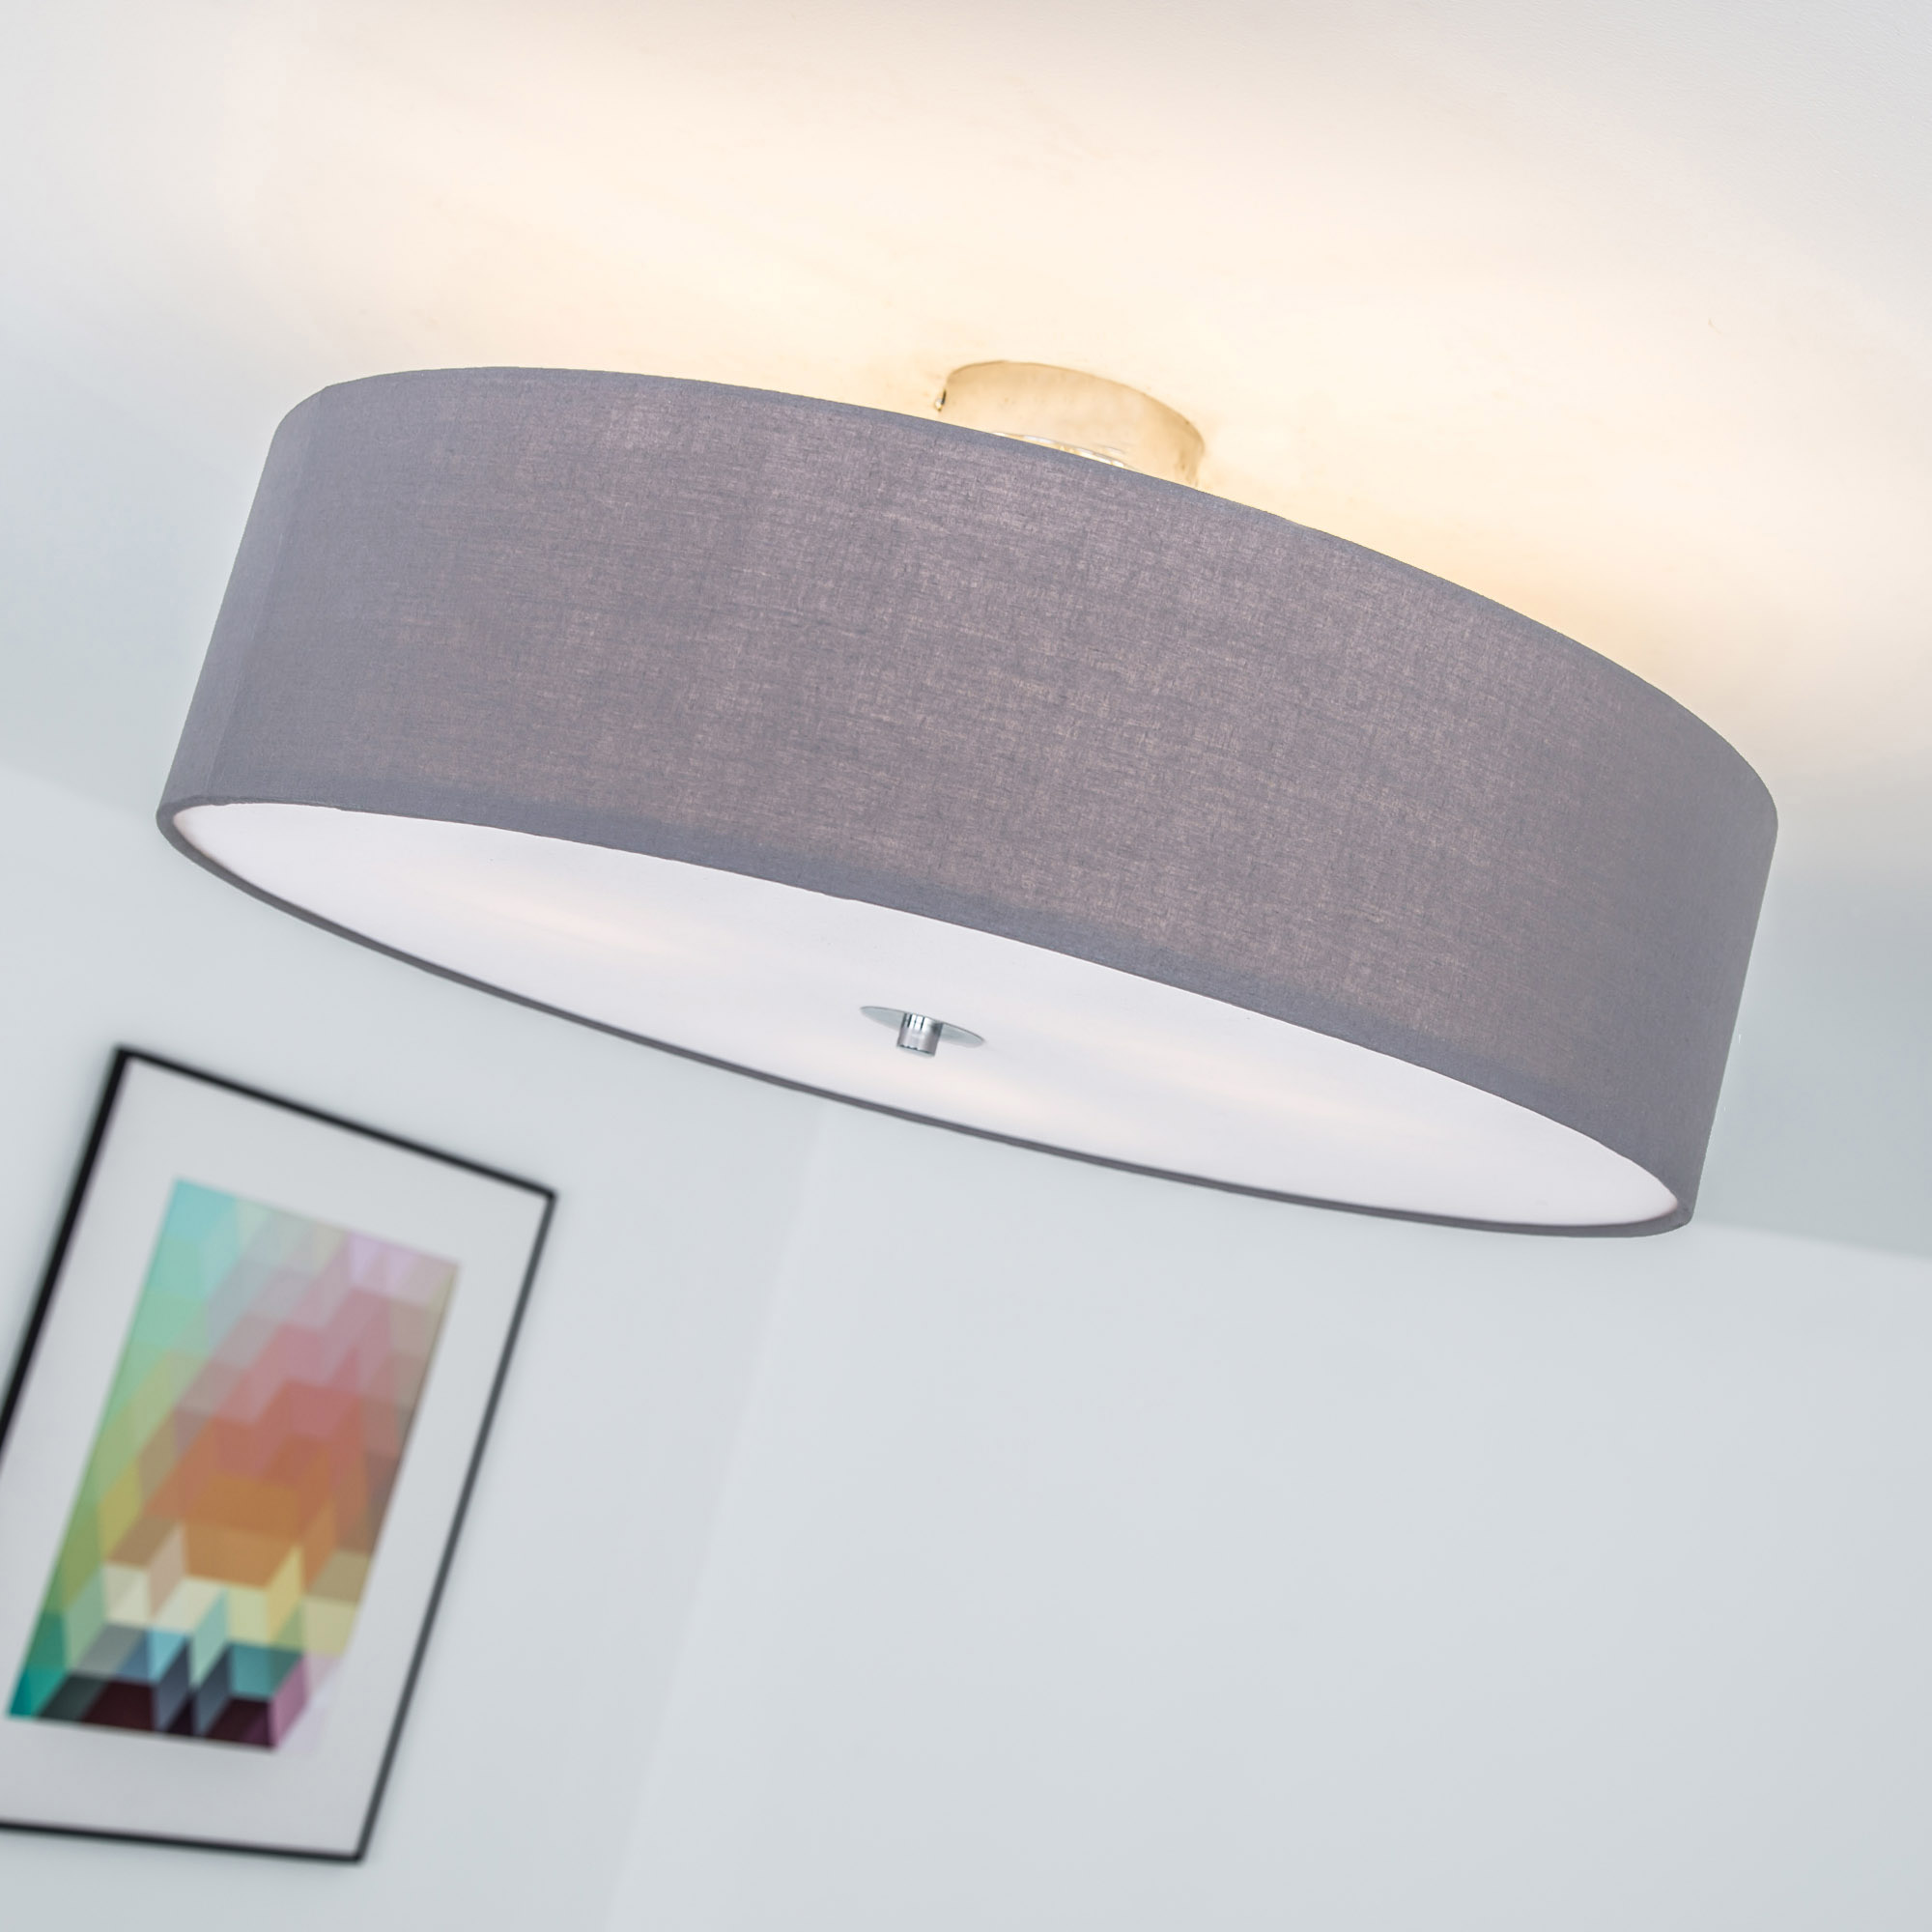 moderne deckenleuchte lampemit textilschirm 3 flammig. Black Bedroom Furniture Sets. Home Design Ideas